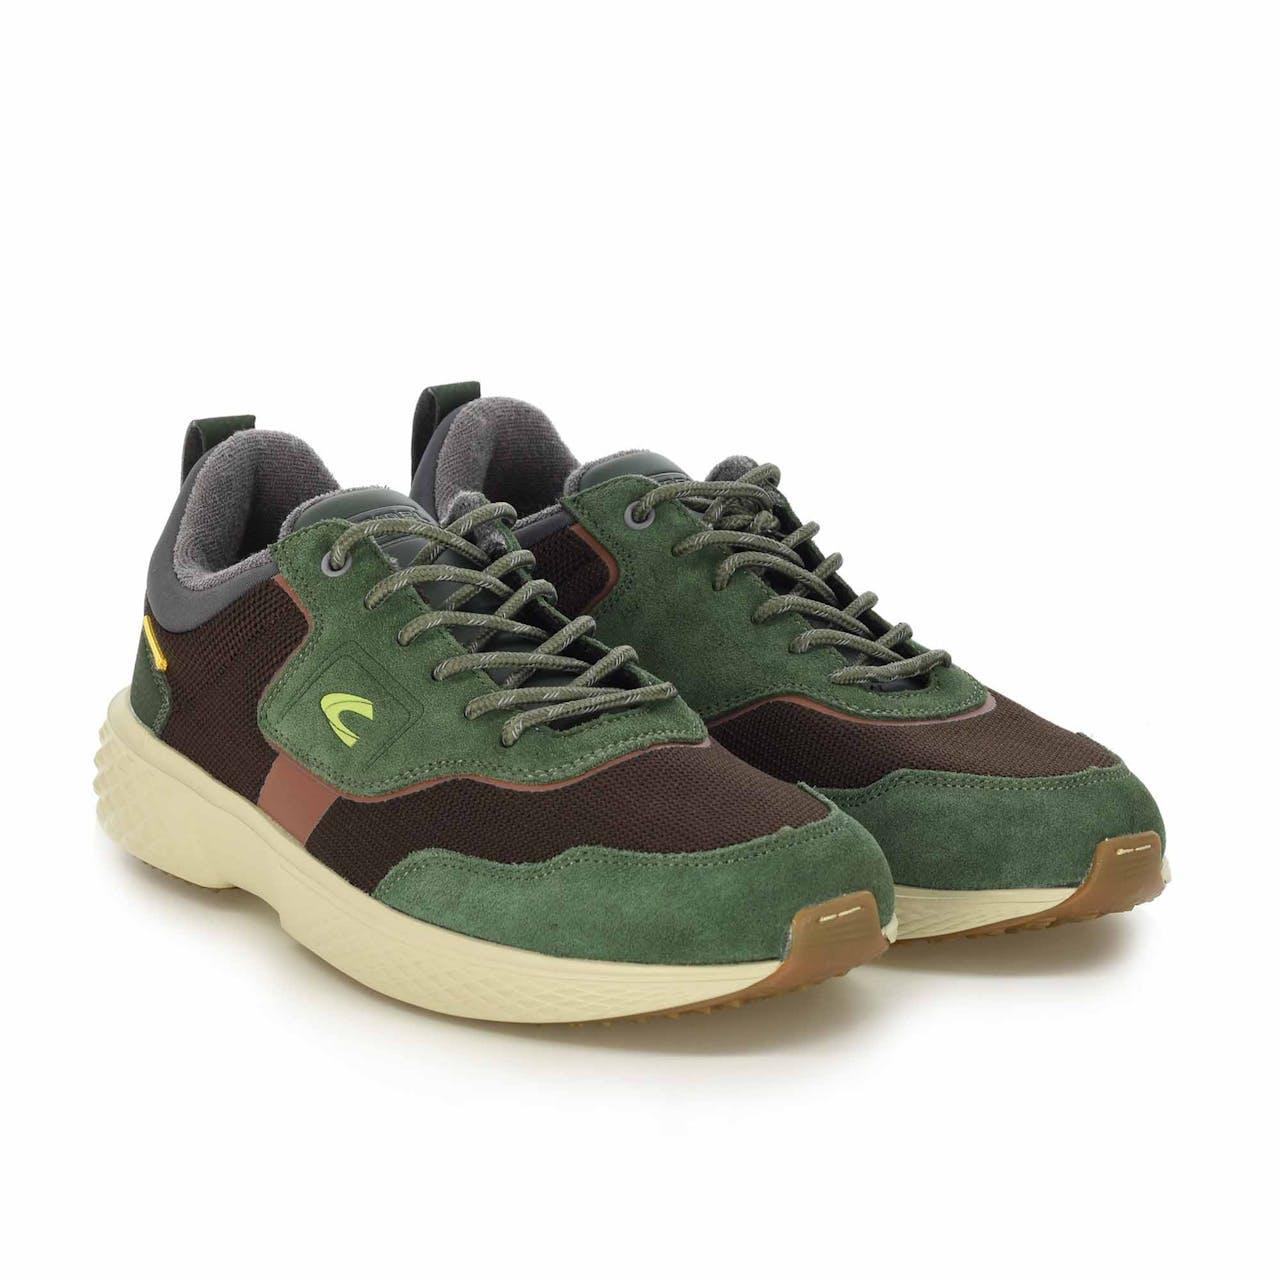 Sneaker - Fly River